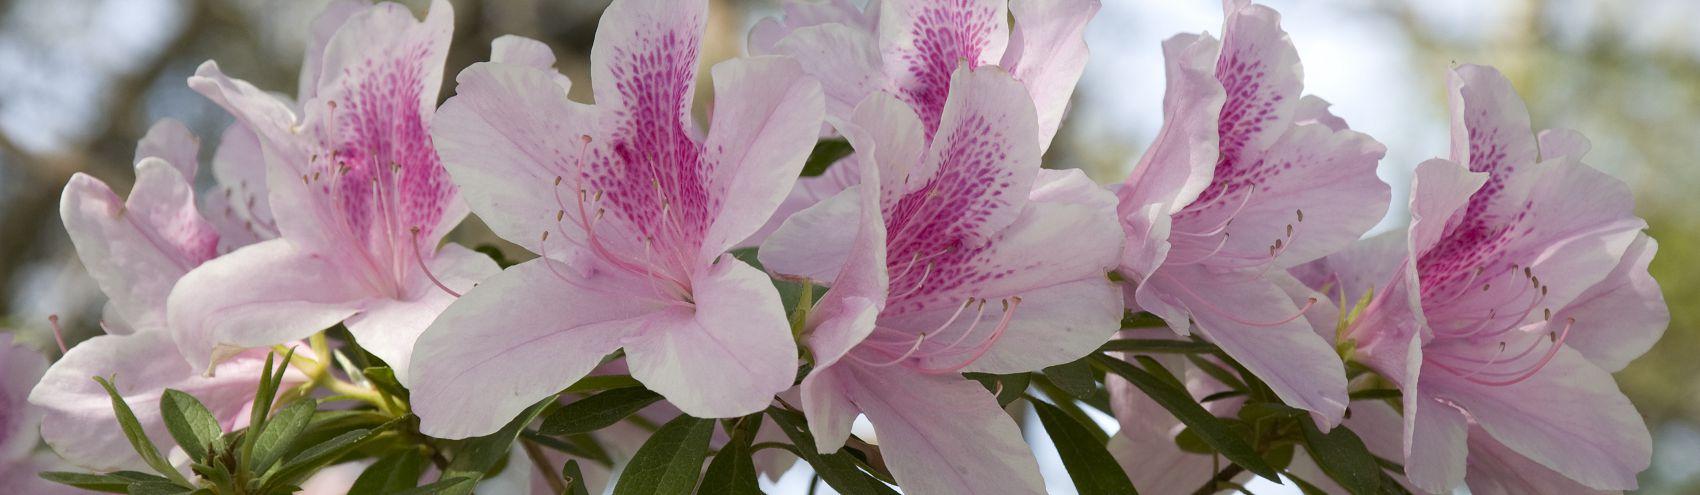 бело-розовые цветы азалия